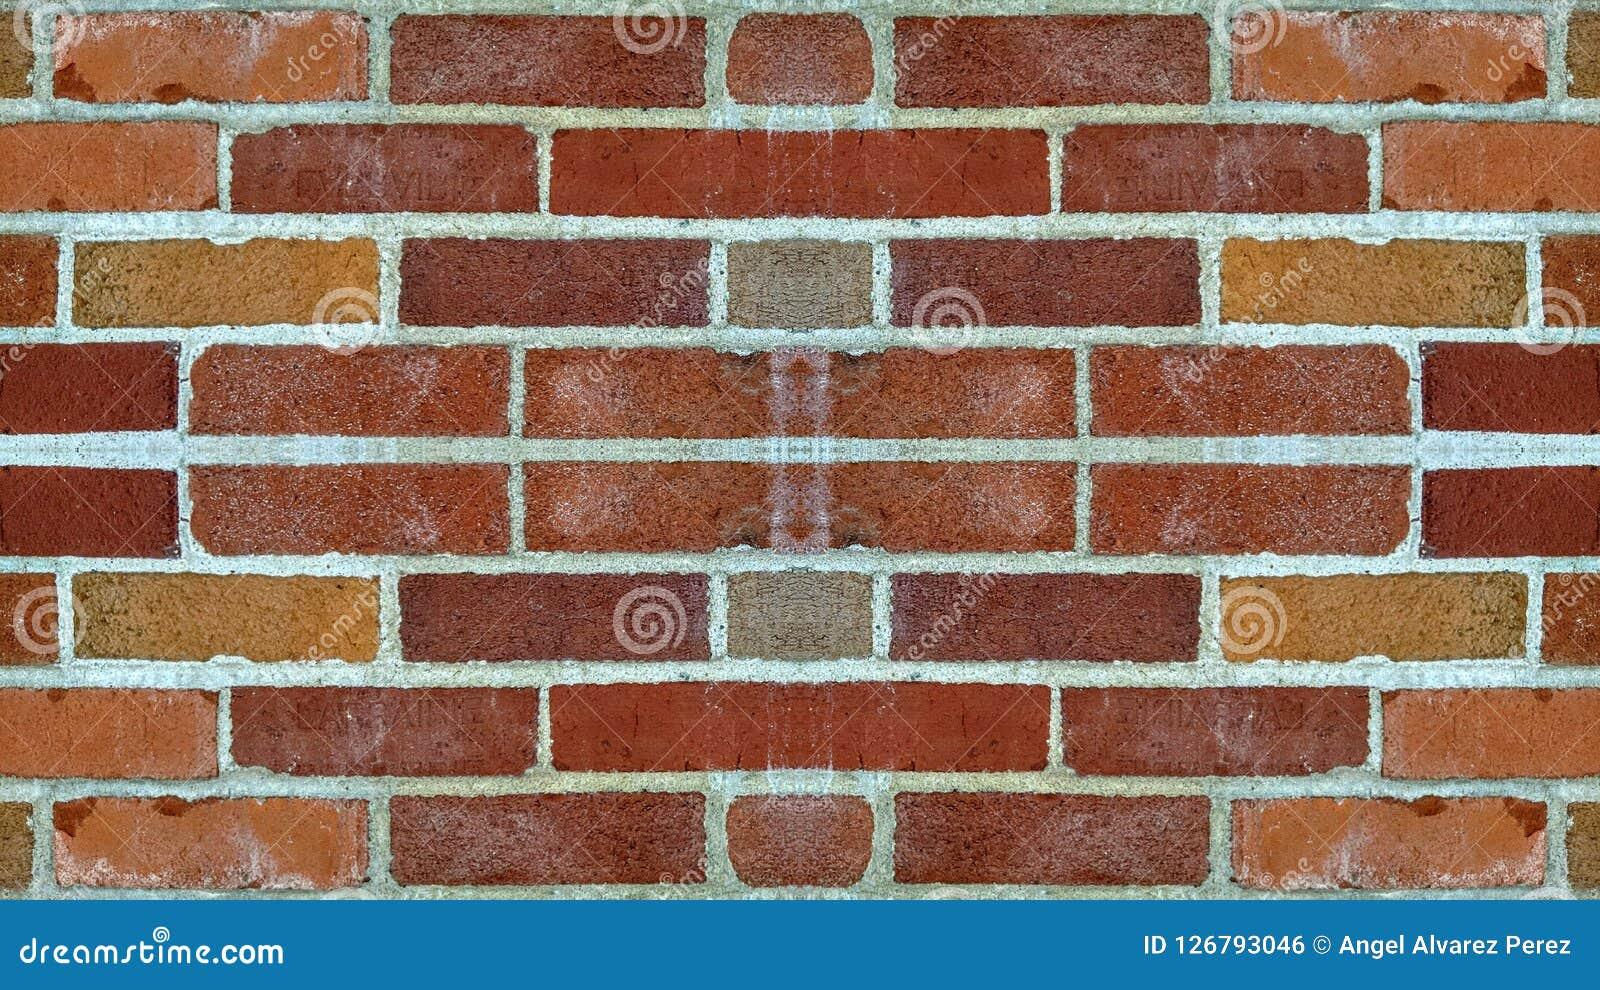 Mirror effect on a brick wall